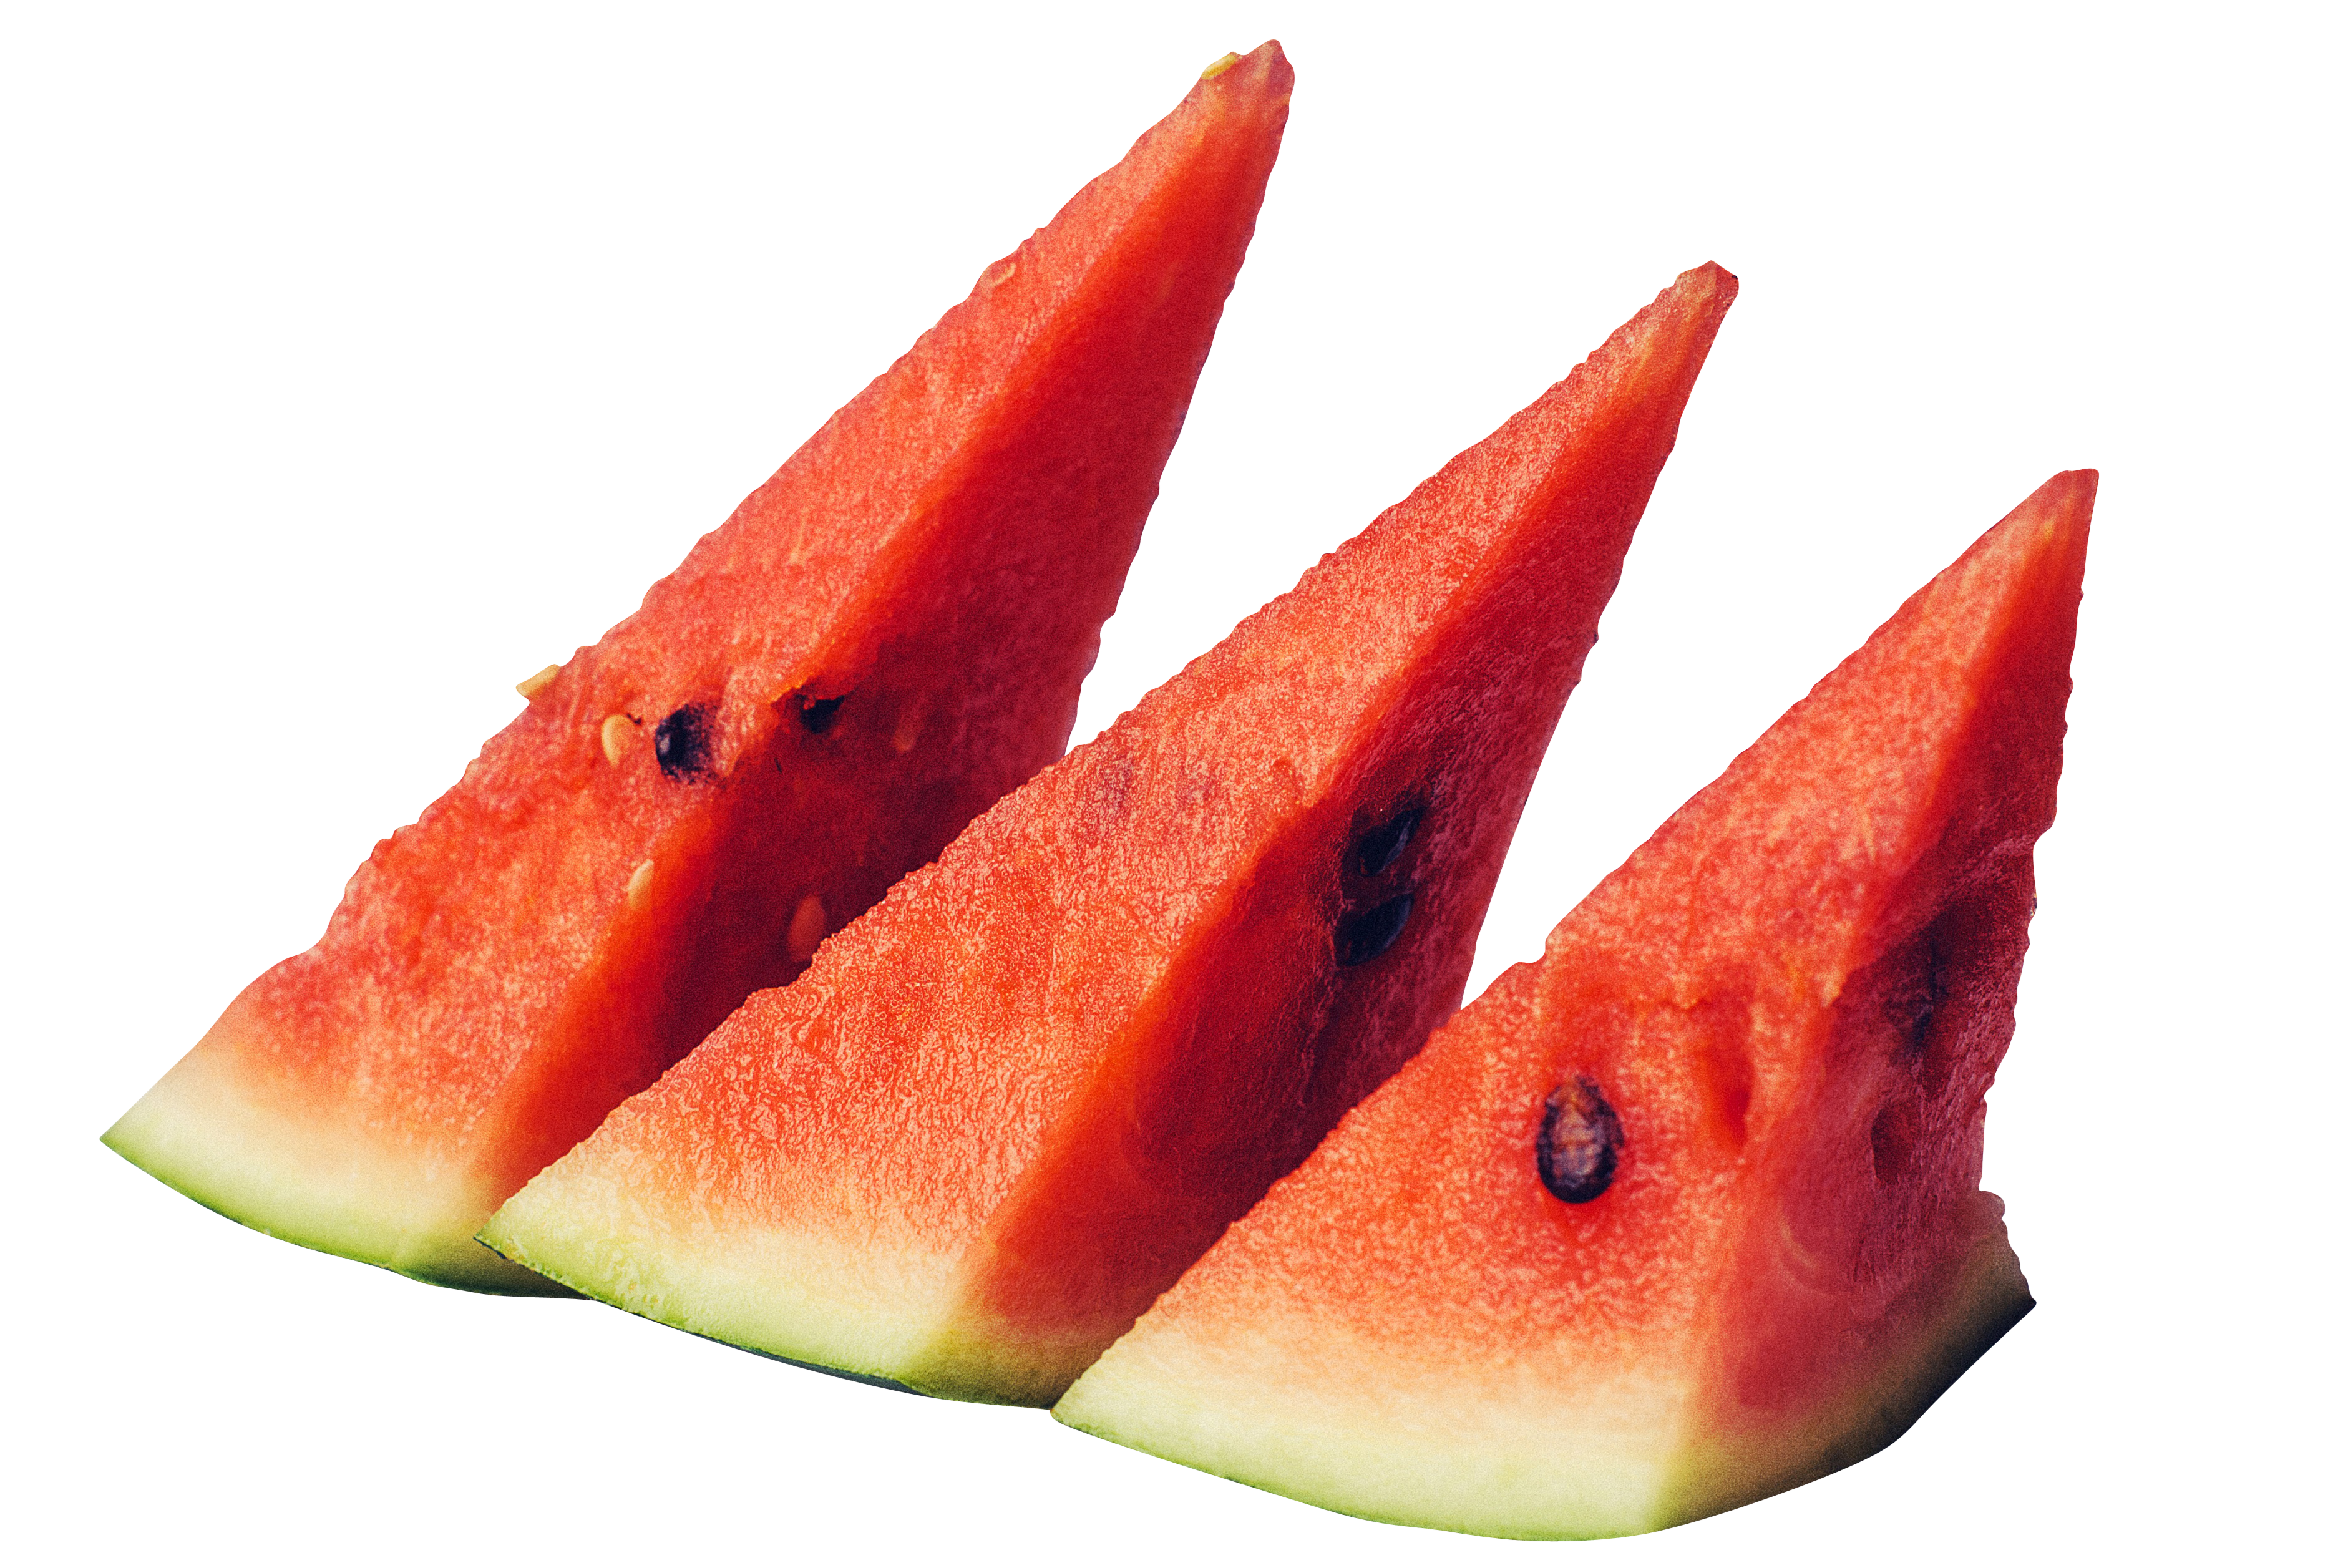 juicy sliced watermelon PNG Image